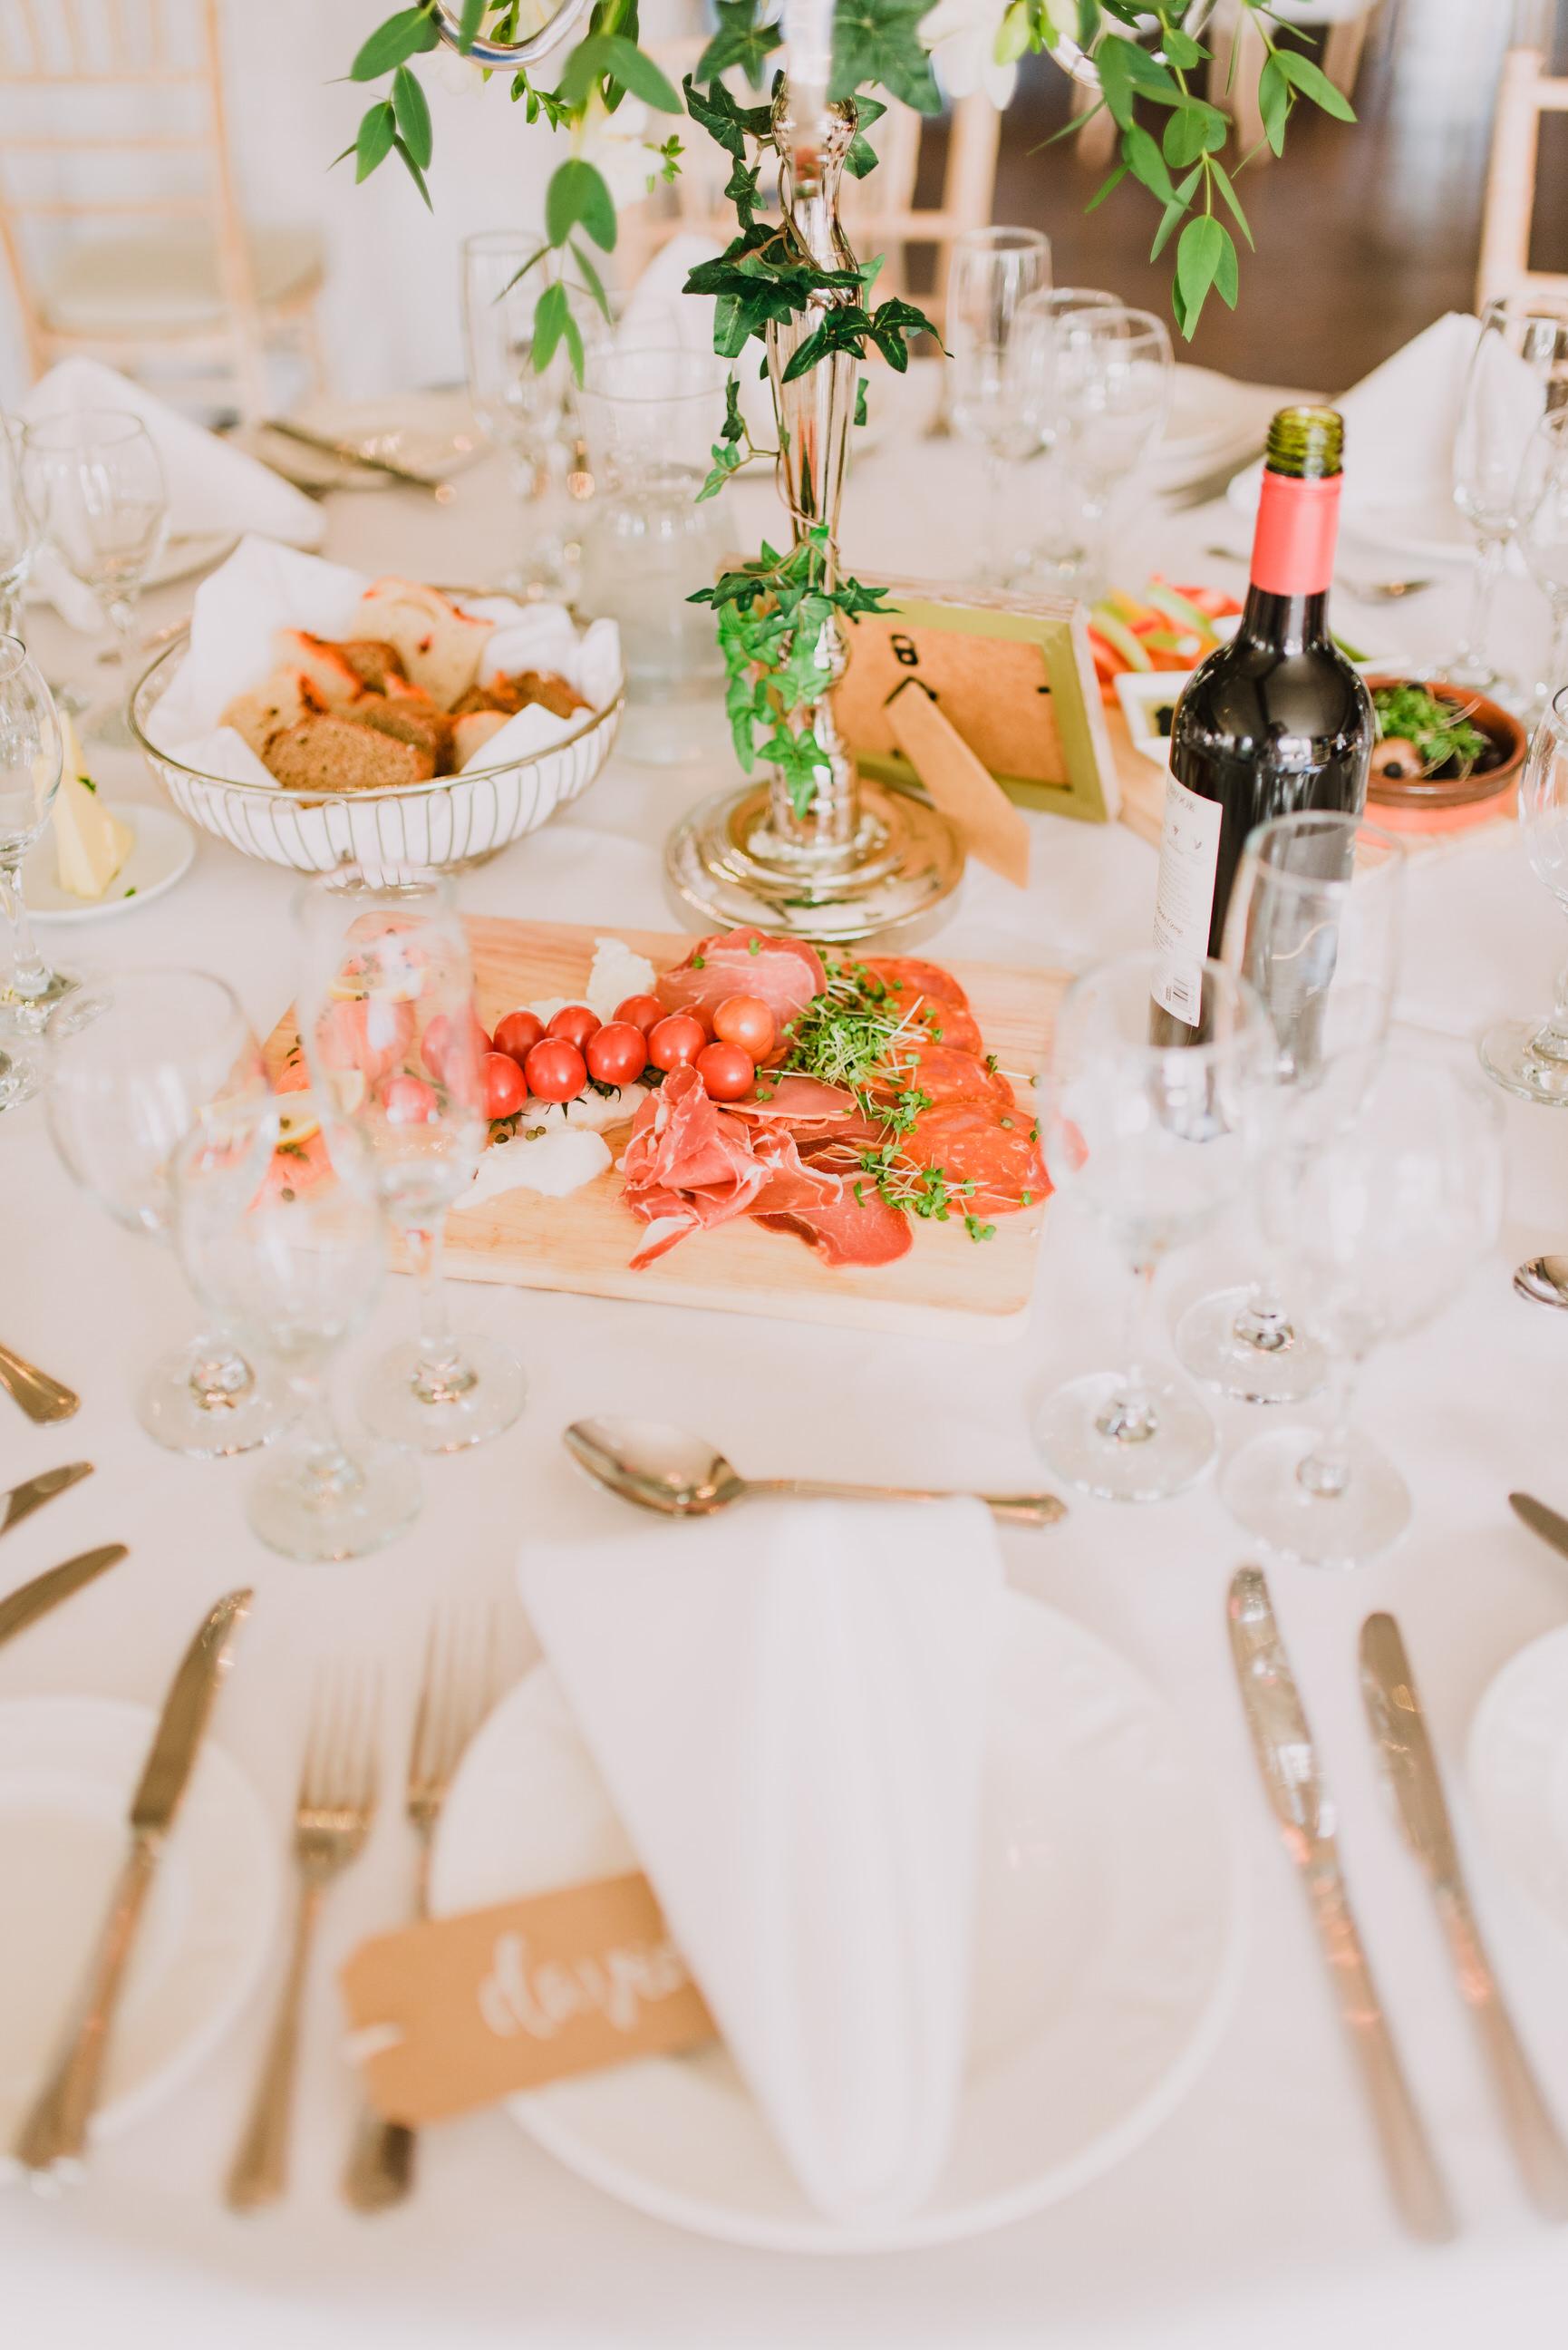 lissanoure castle wedding, northern ireland wedding photographer, romantic northern irish wedding venue, castle wedding ireland, natural wedding photography ni (102).jpg